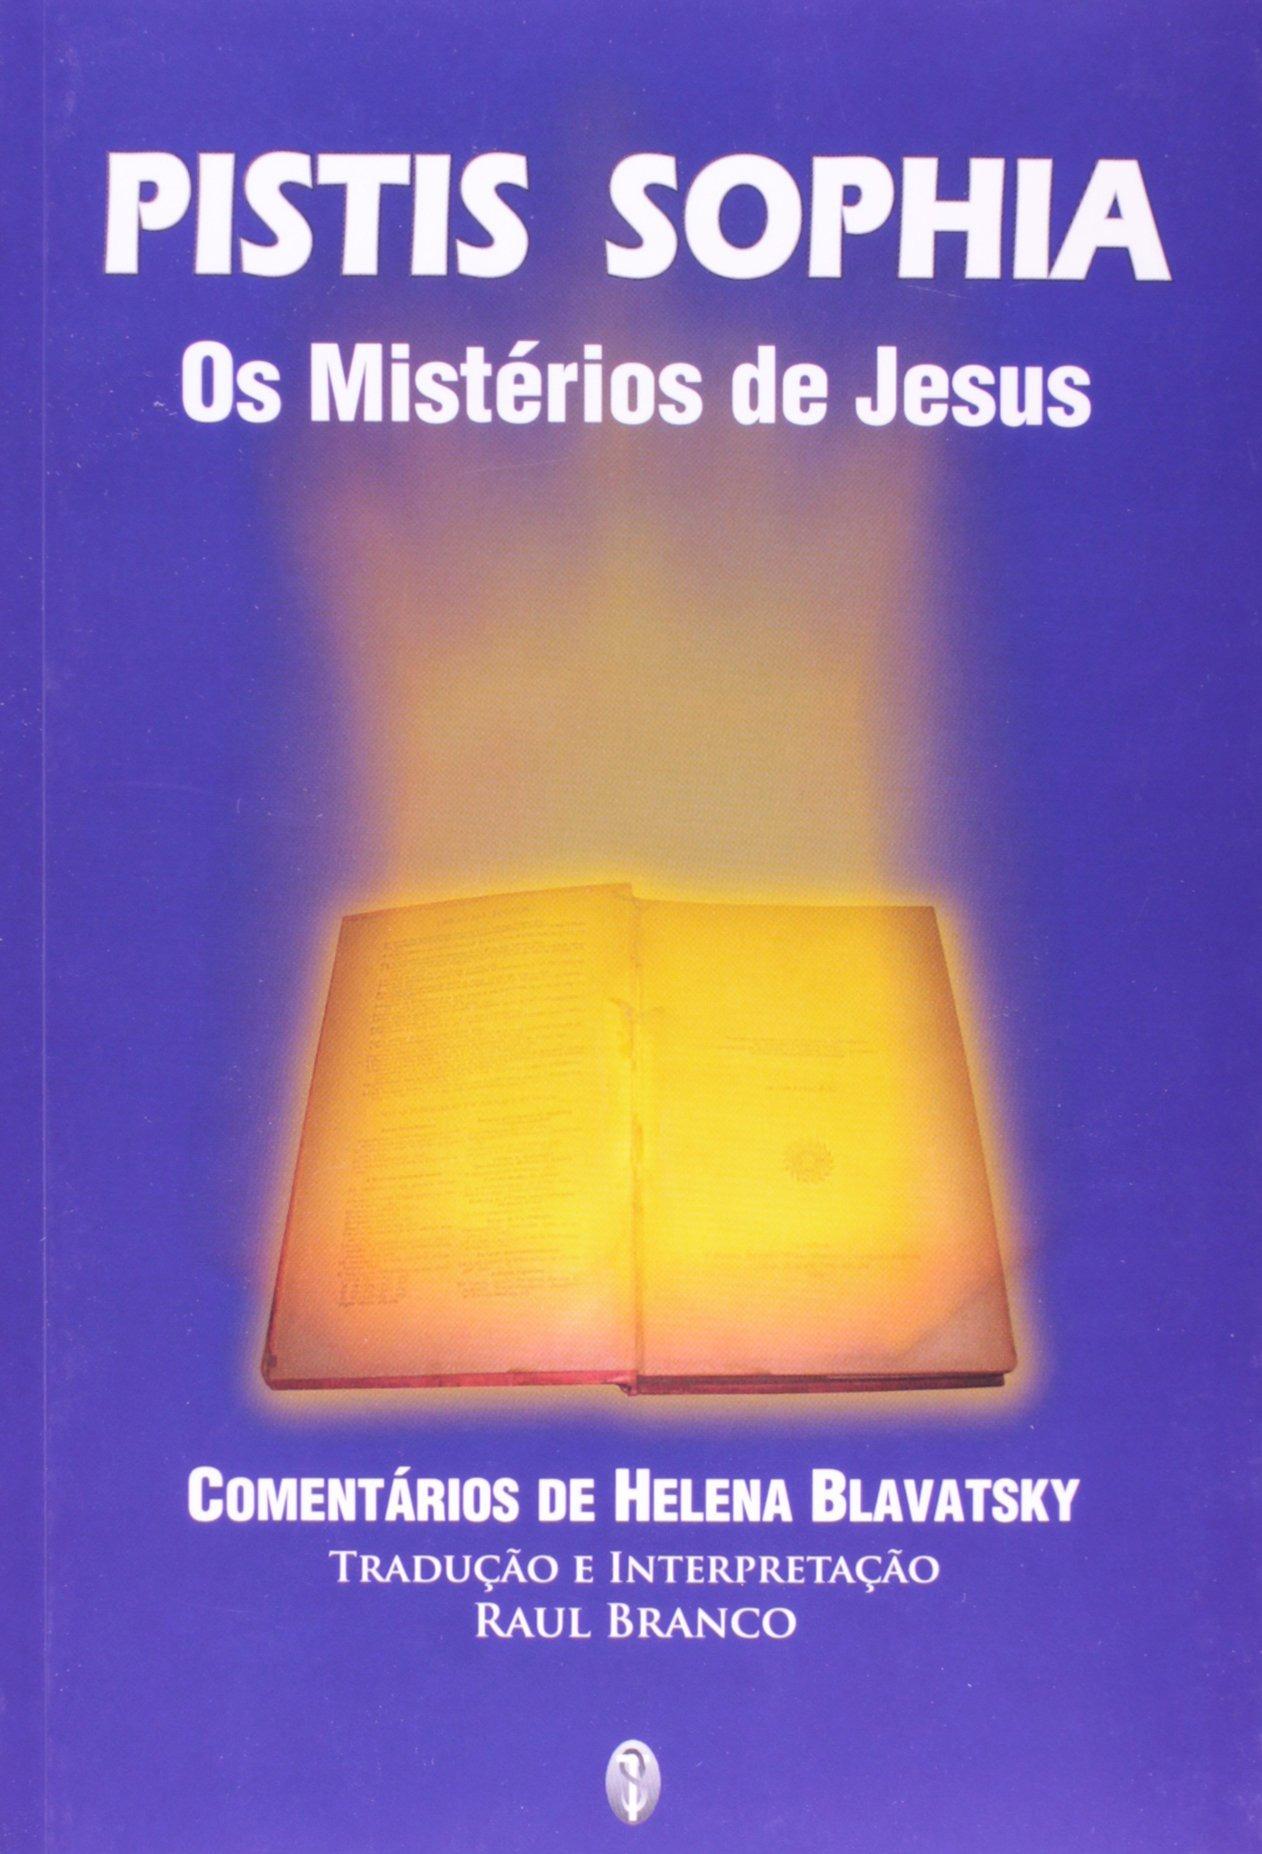 Pistis Sophia - Os Mistérios de Jesus